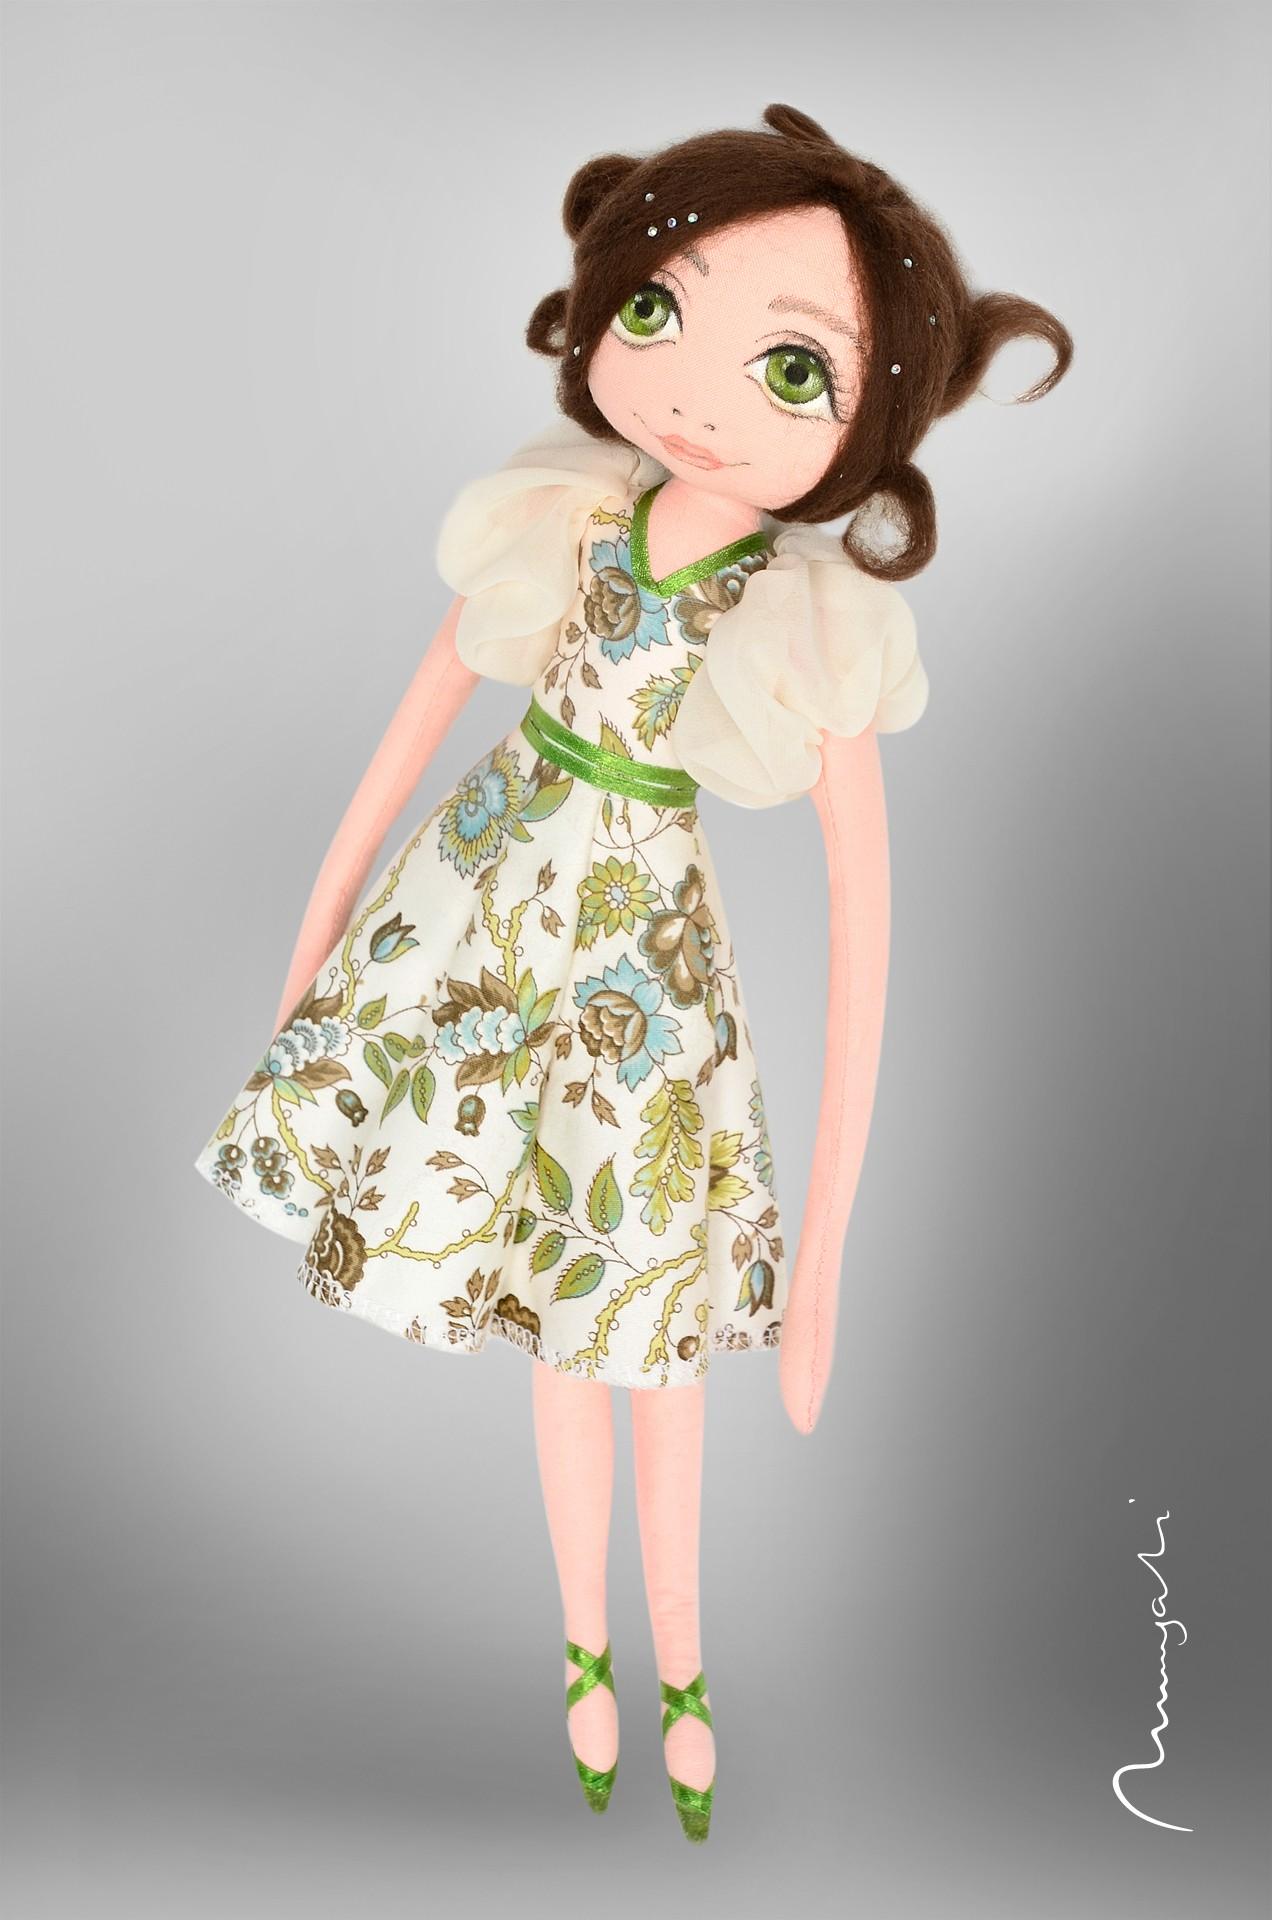 Ola - artystyczna lalka szmaciana